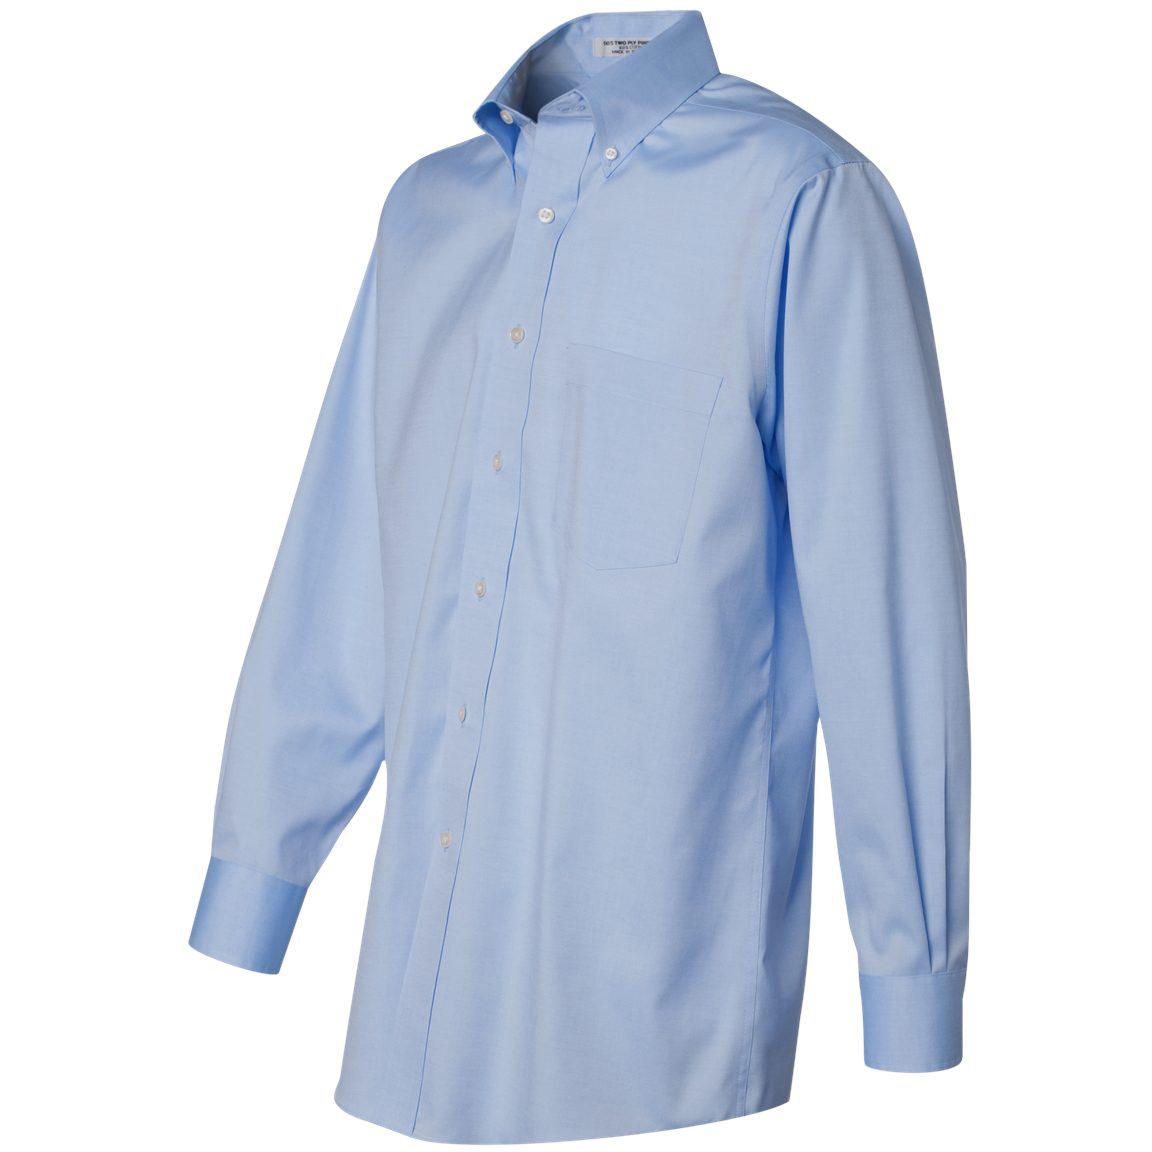 Van Heusen 13v0143 Non Iron Pinpoint Oxford Shirt Blue